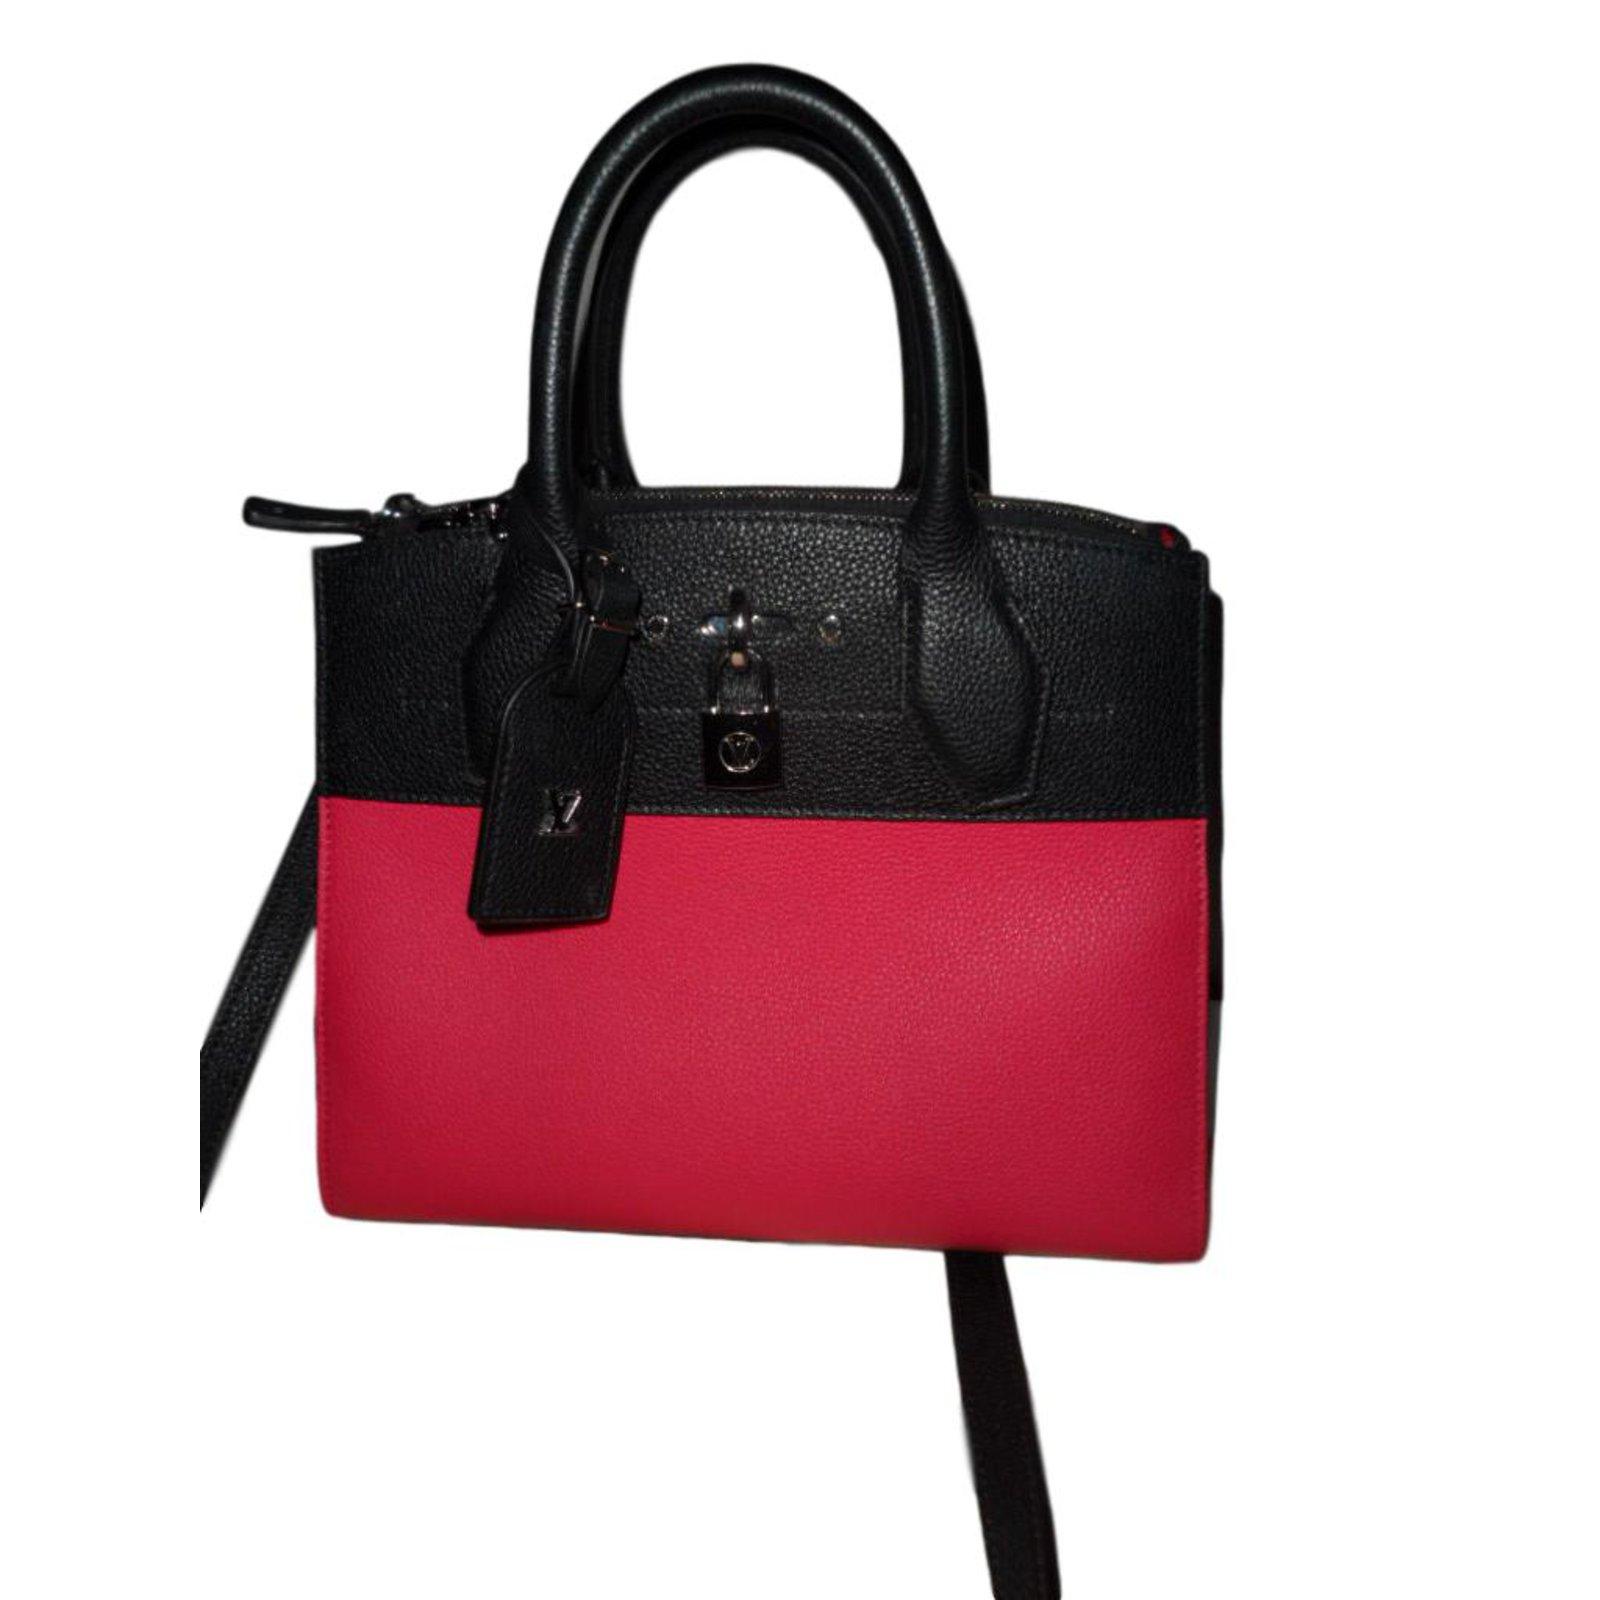 8892e61d16a8 Louis Vuitton Handbags Handbags Leather Black ref.46389 - Joli Closet